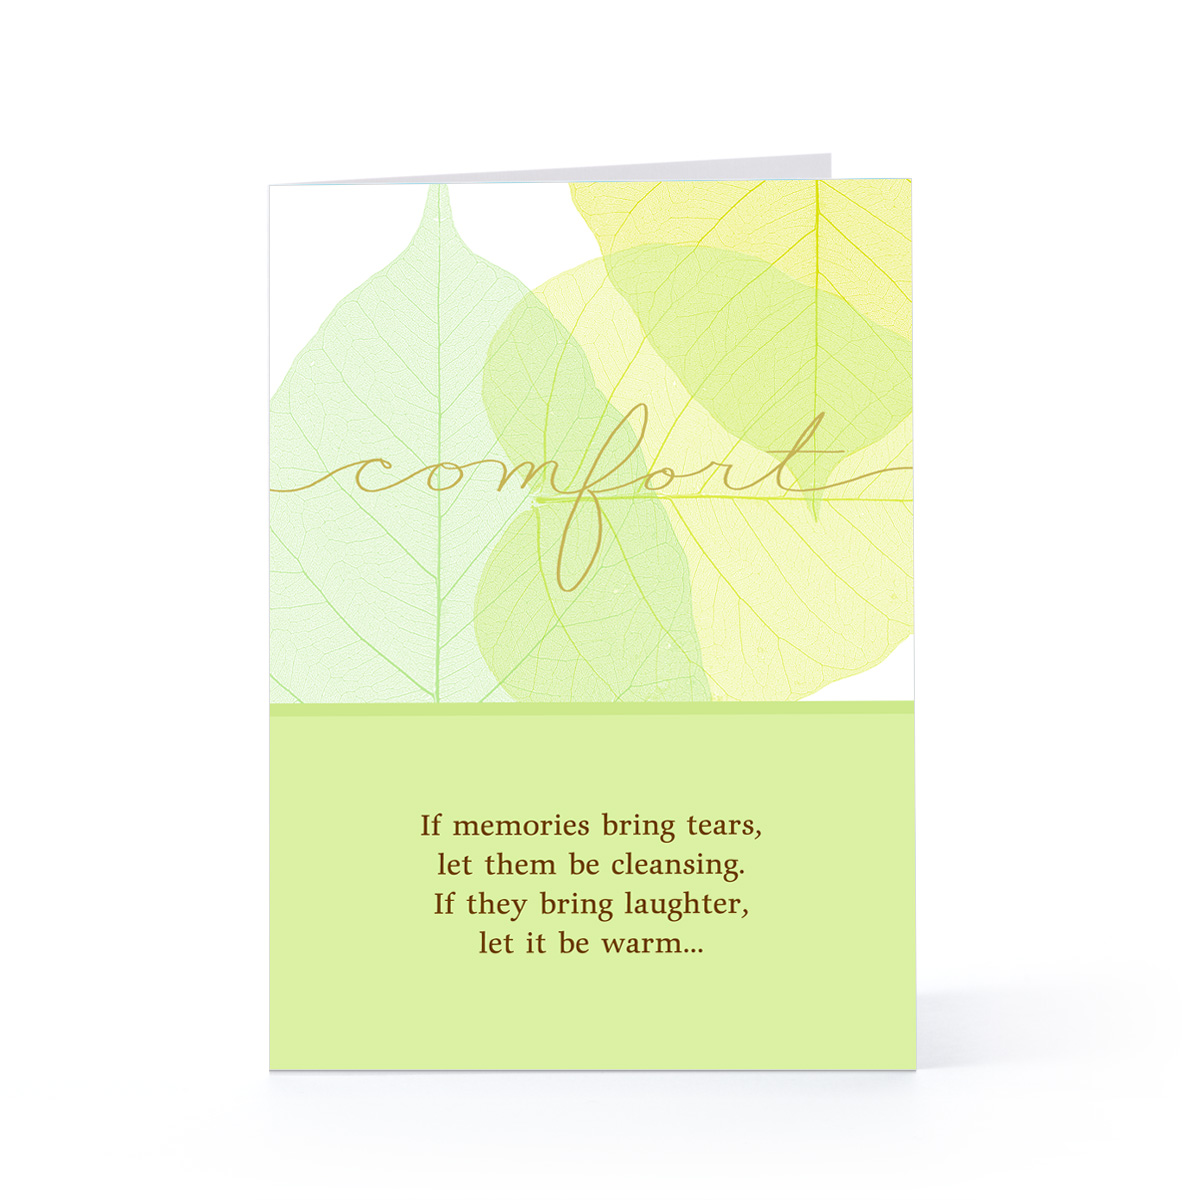 Free Printable Hallmark Birthday Cards document analyst cover letter – Free Printable Hallmark Birthday Cards